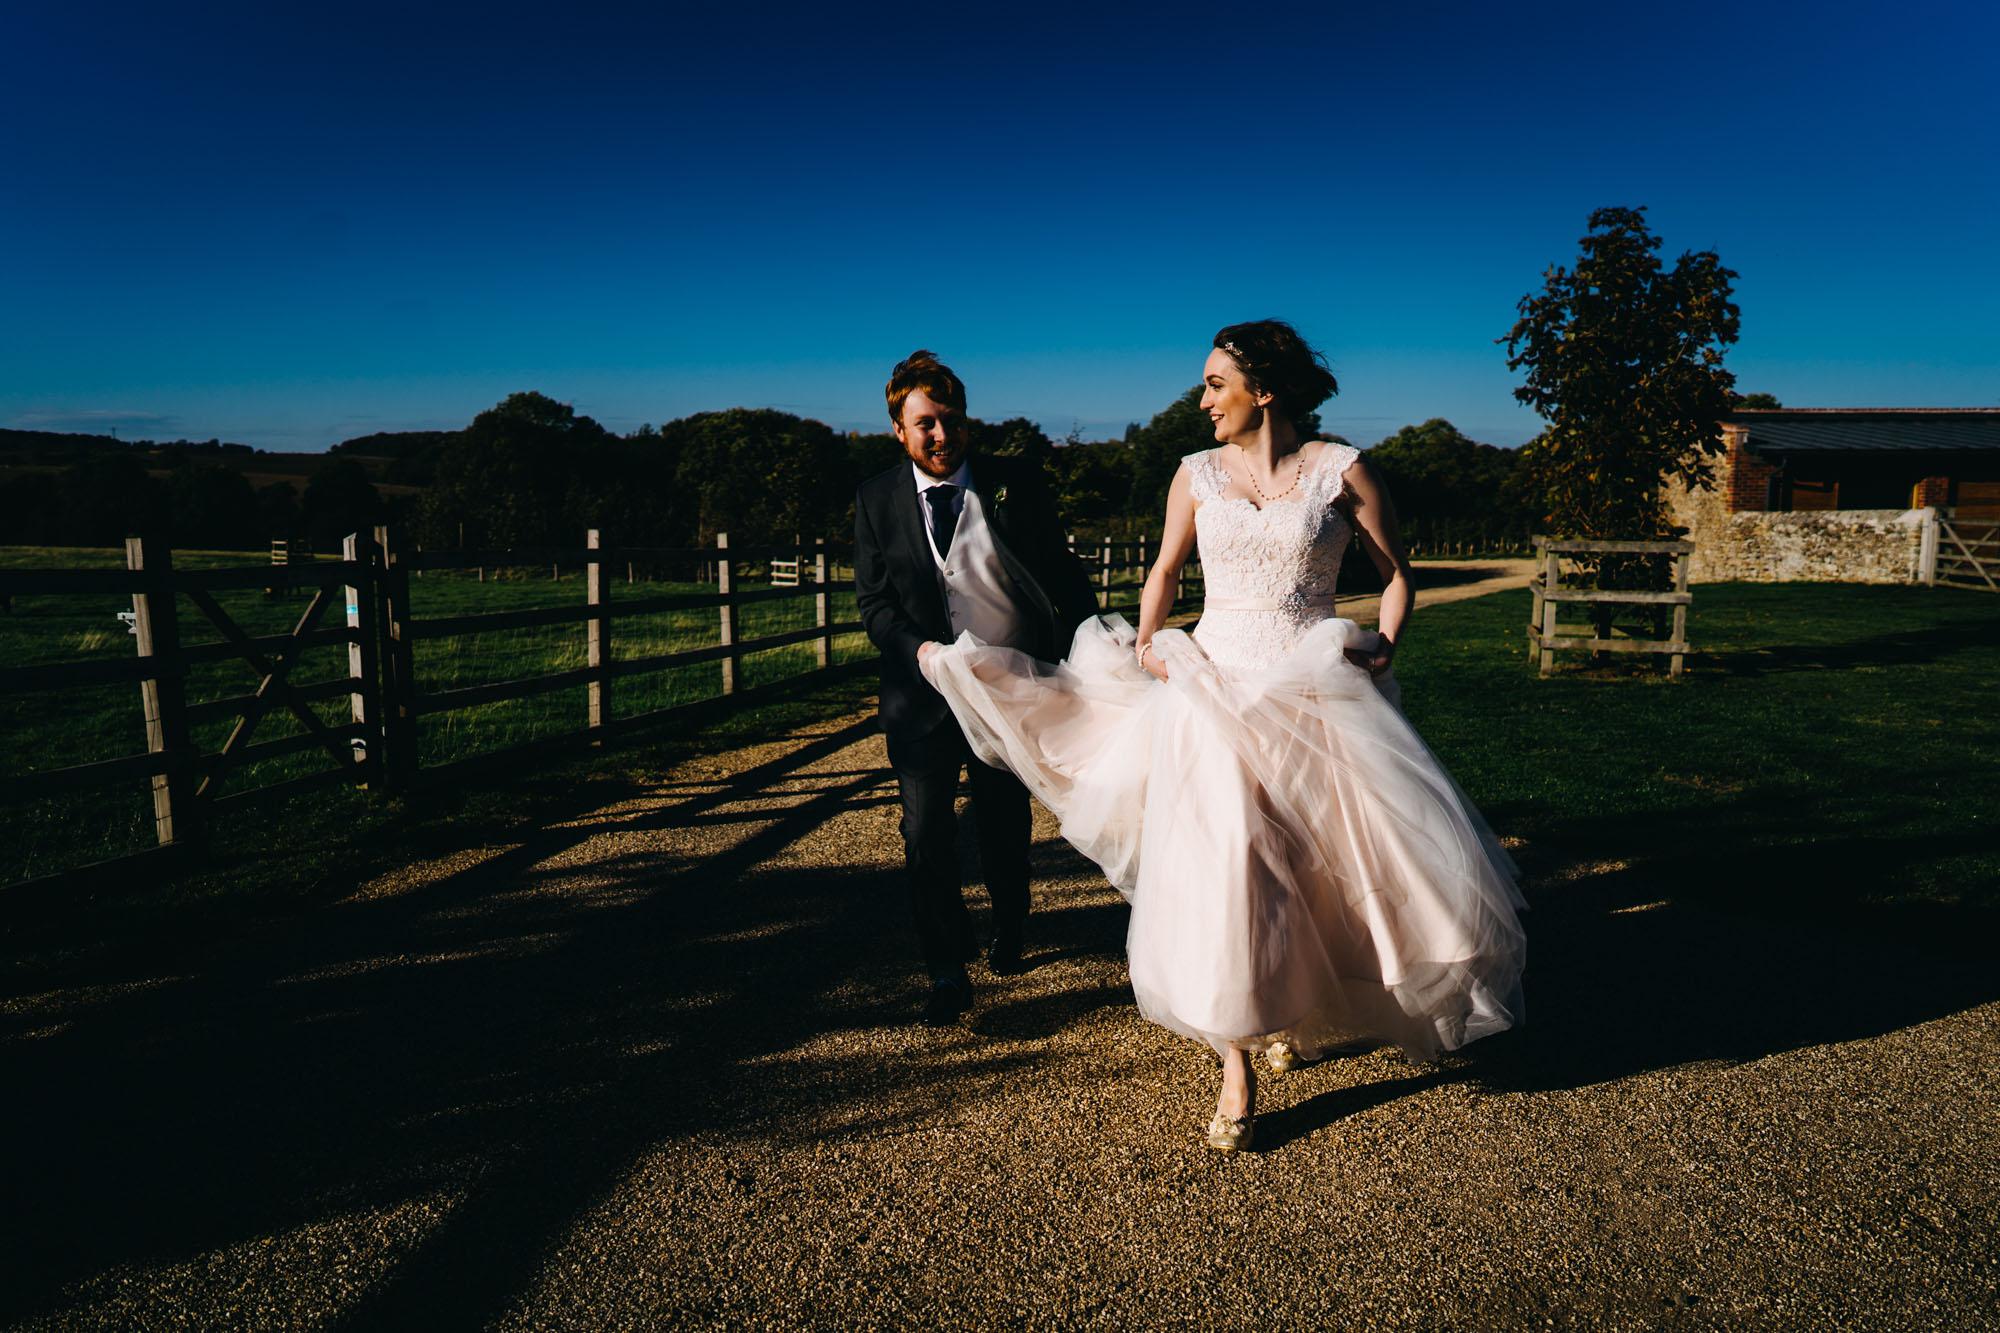 wedding-at-dodford-manor-63